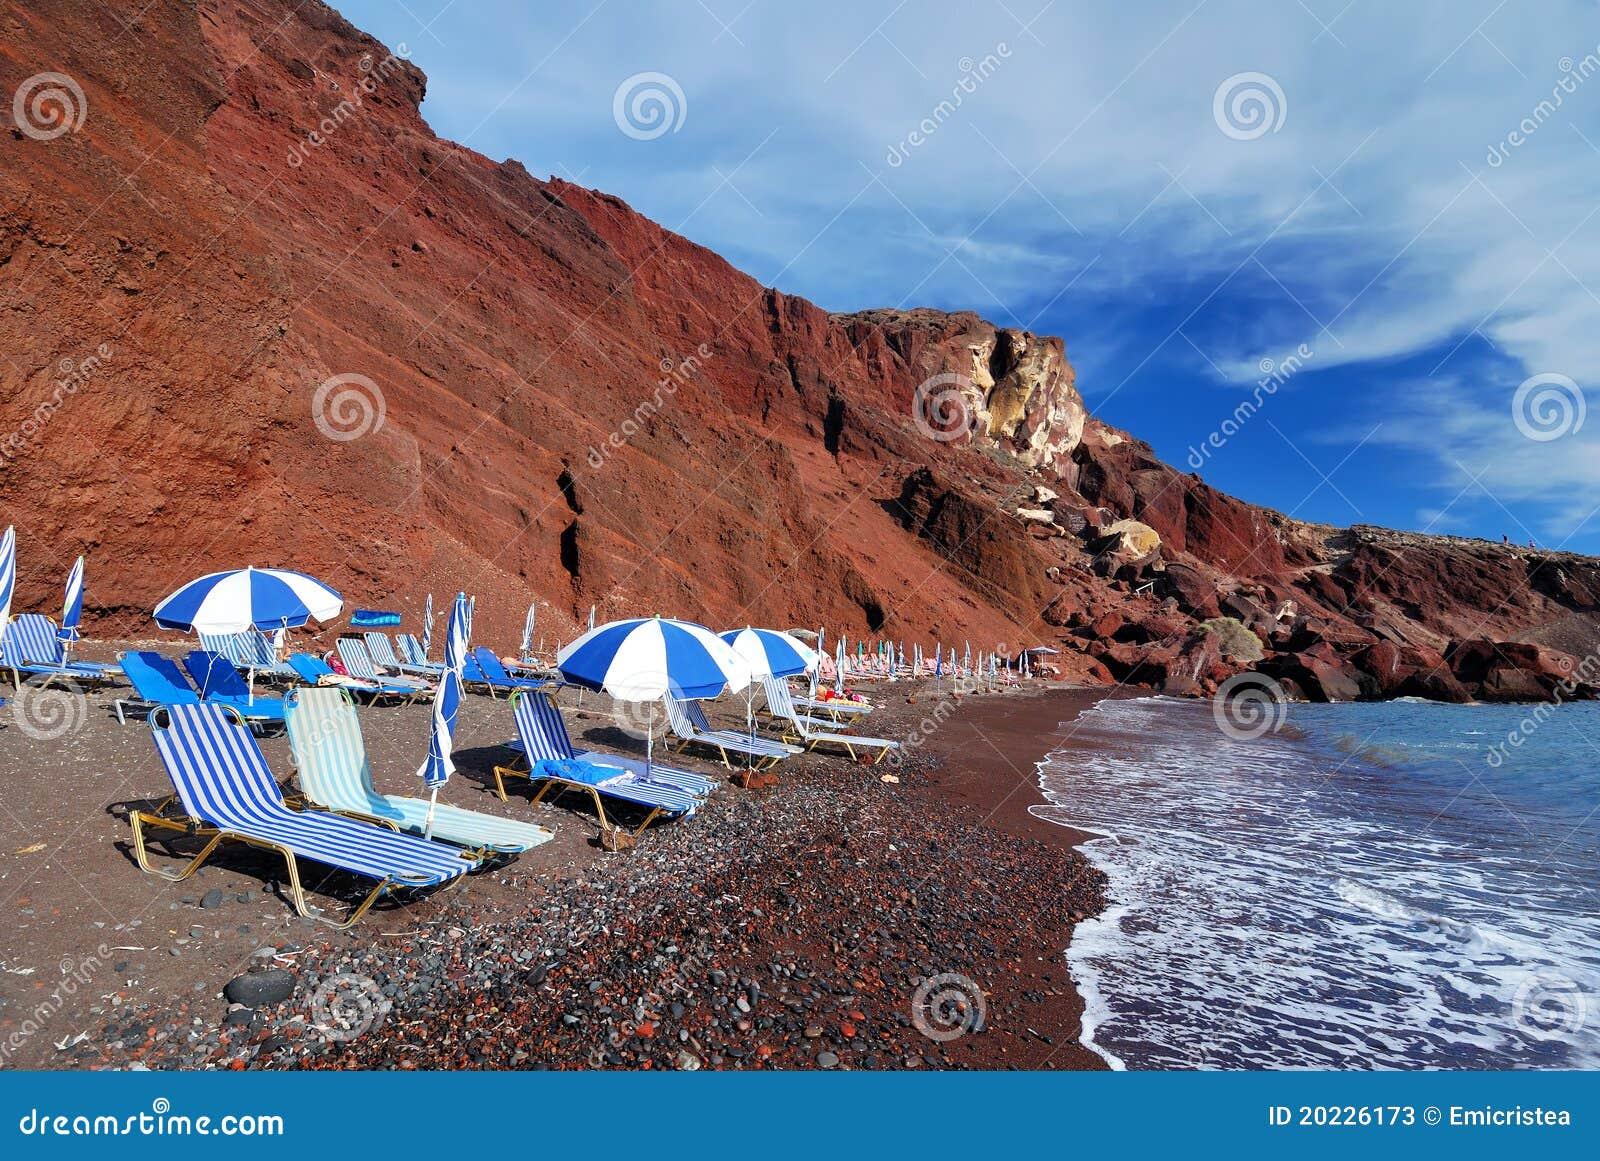 Red Beach Santorini Island Thira Greece Stock Photos